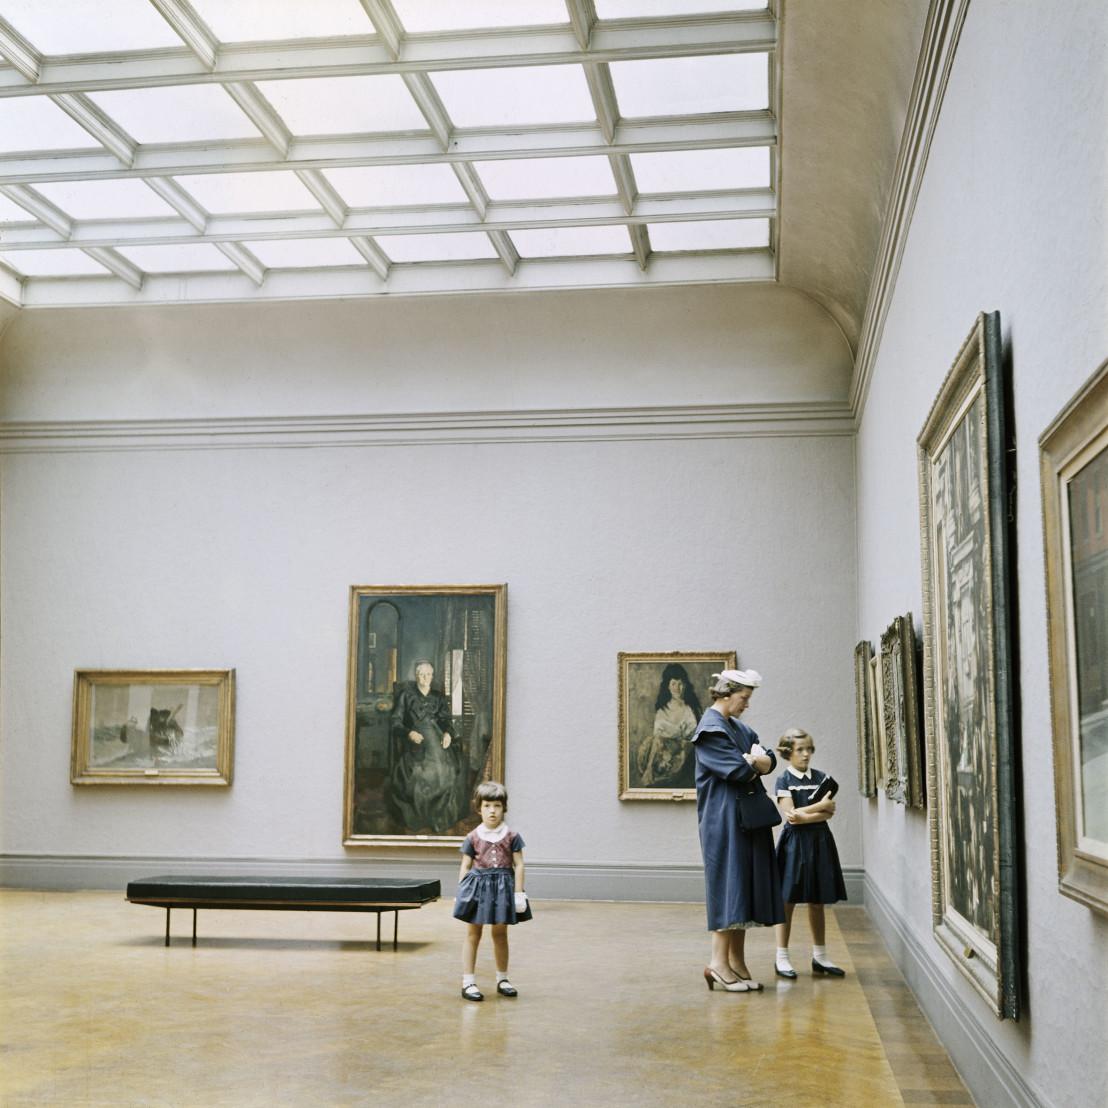 Undated©Estate of Vivian Maier